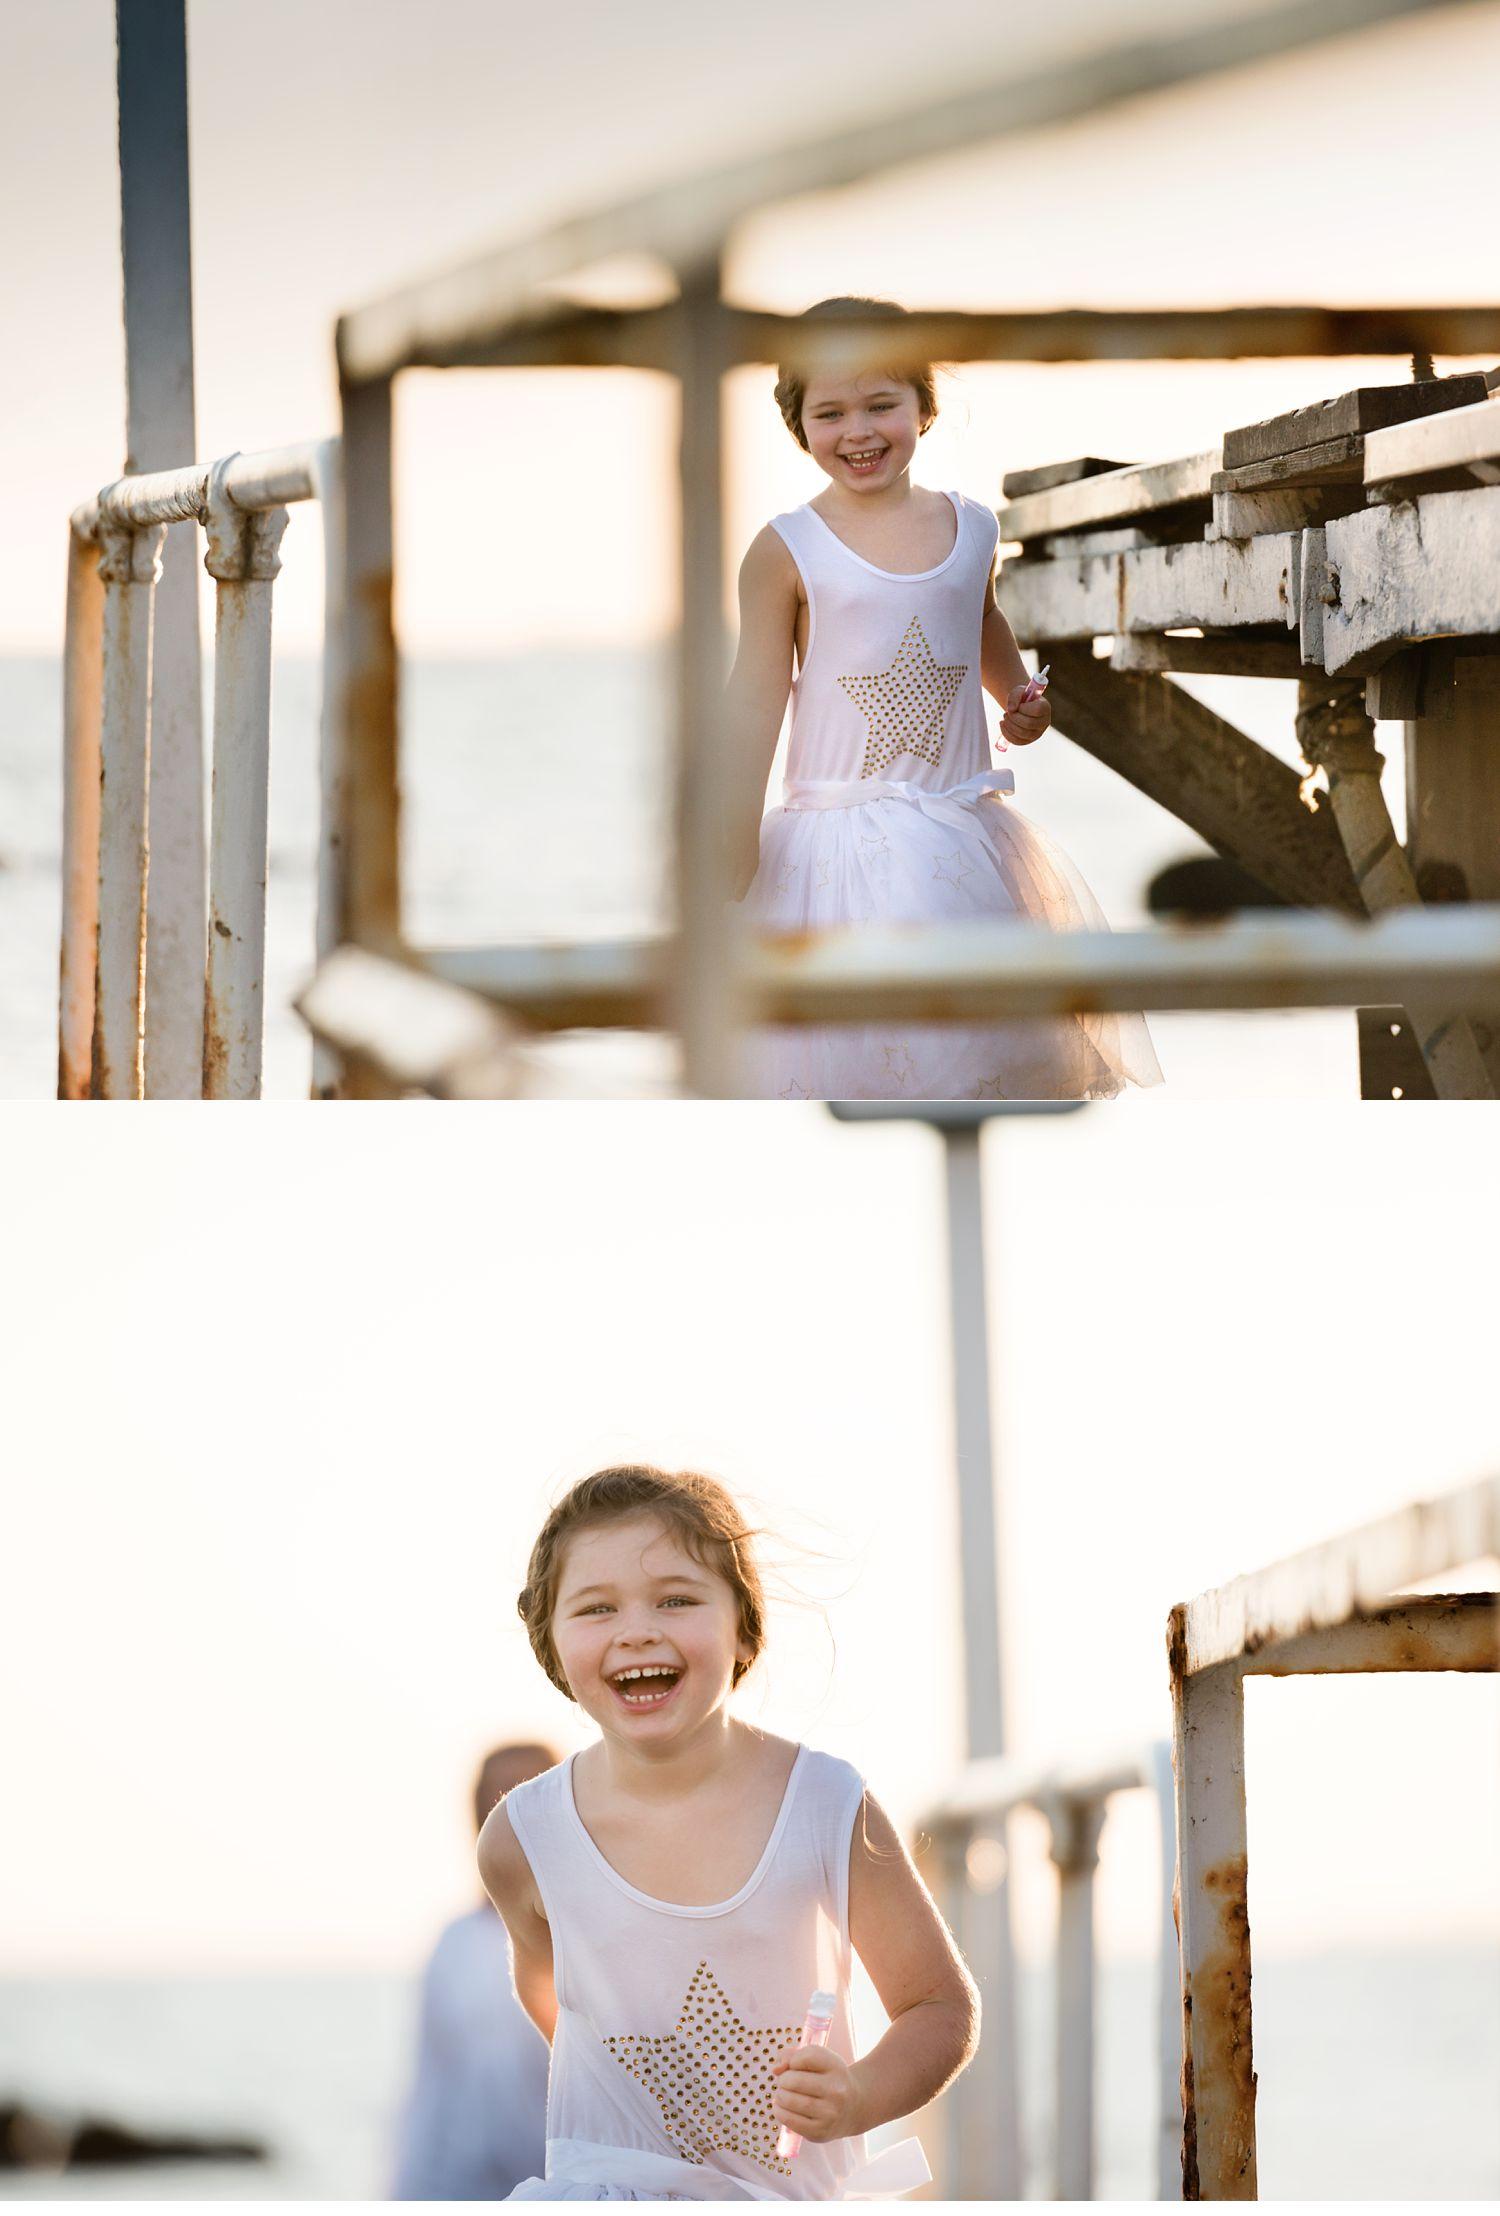 melbourne-photographer-capturing-beautiful-moments.jpg